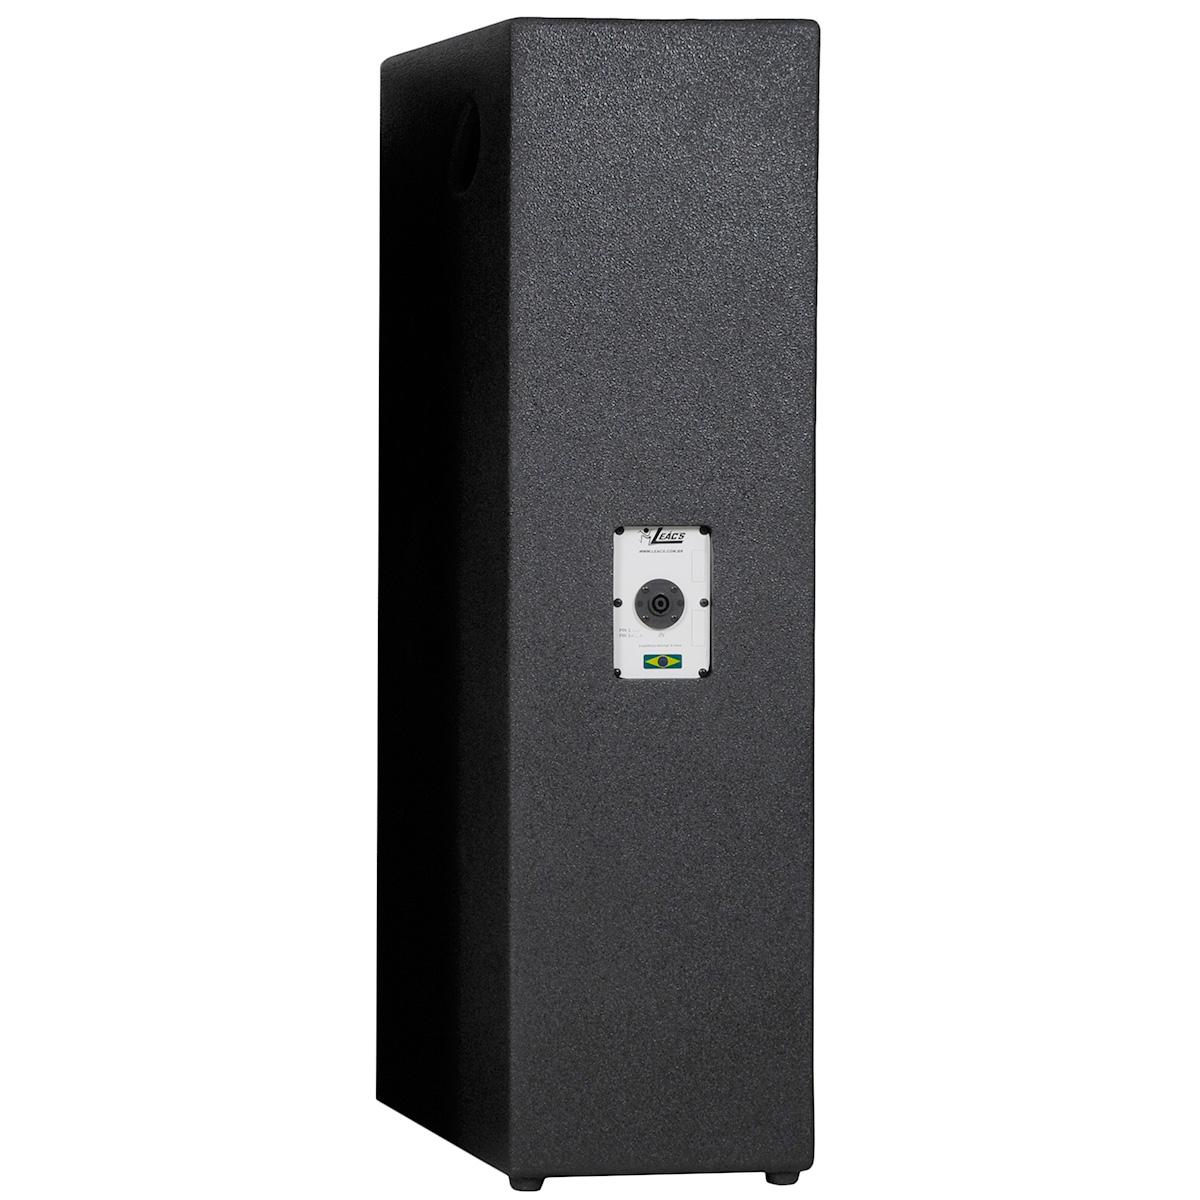 Caixa Passiva Fal 2x15 Pol 700W - VIP 1000 Plus Dupla FLY Leacs